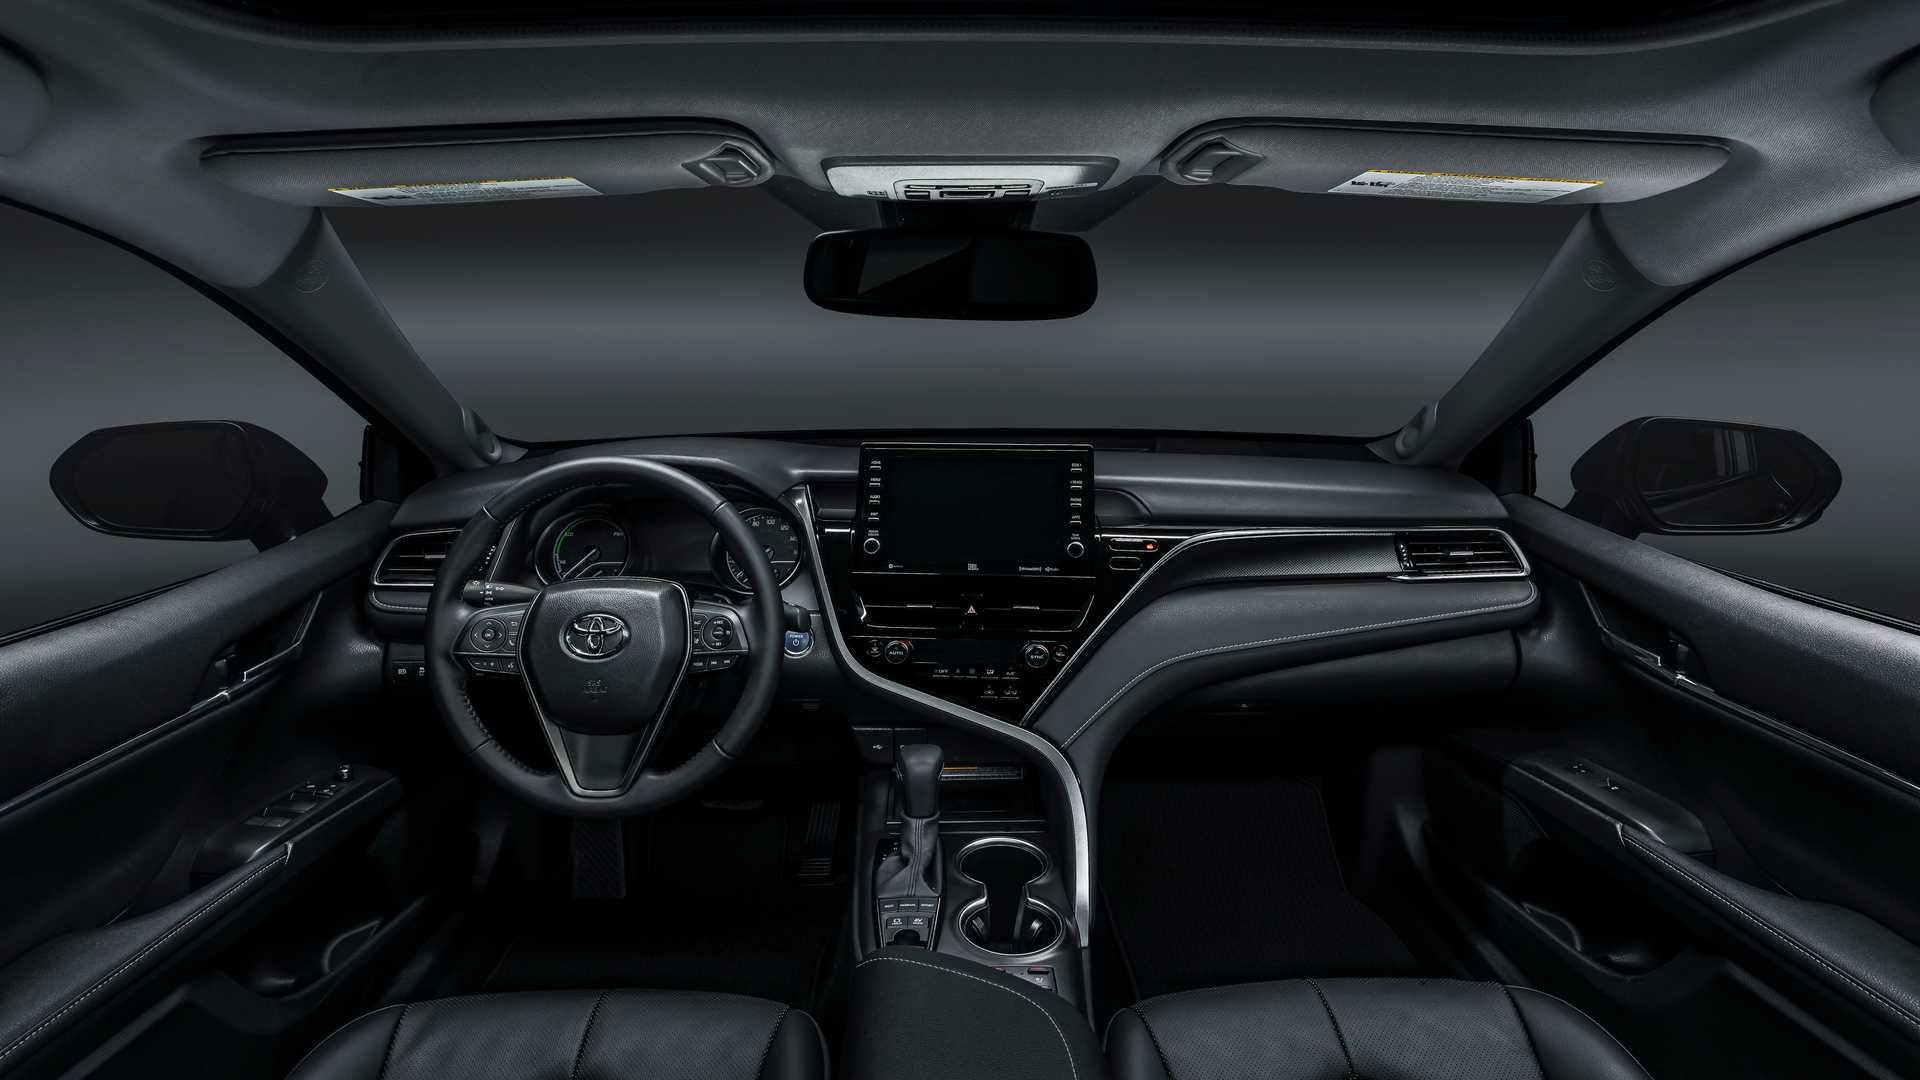 camry toyota xse hybrid safety sense interior arrives better introduces changes motor1 corolla sedan range does upgrades